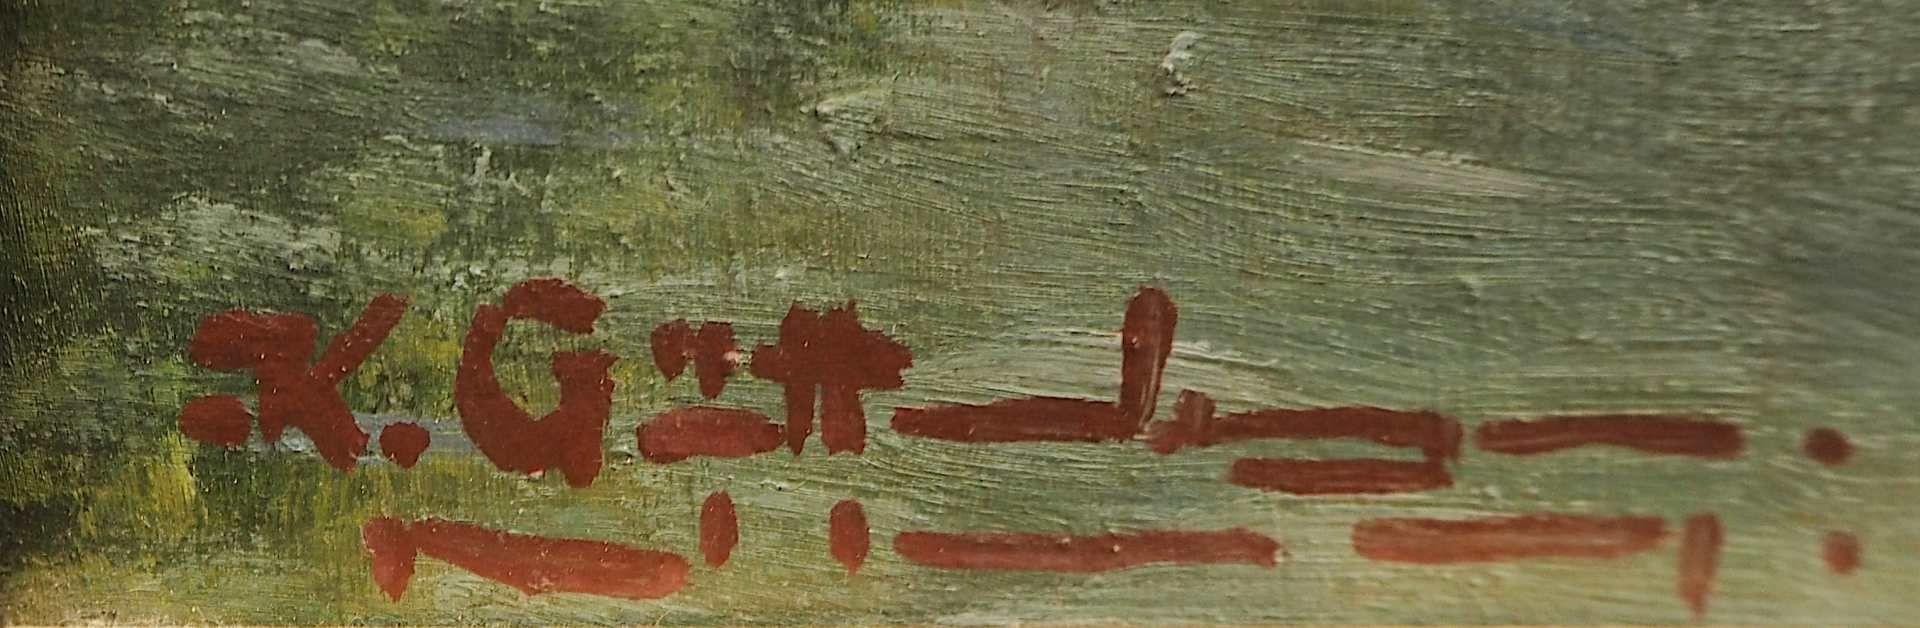 "1 Ölgemälde ""Gebirgspanorama mit Bergsee"" L.u. unles. sign. K. GÜTTENBERGER (?) (wo - Bild 3 aus 4"